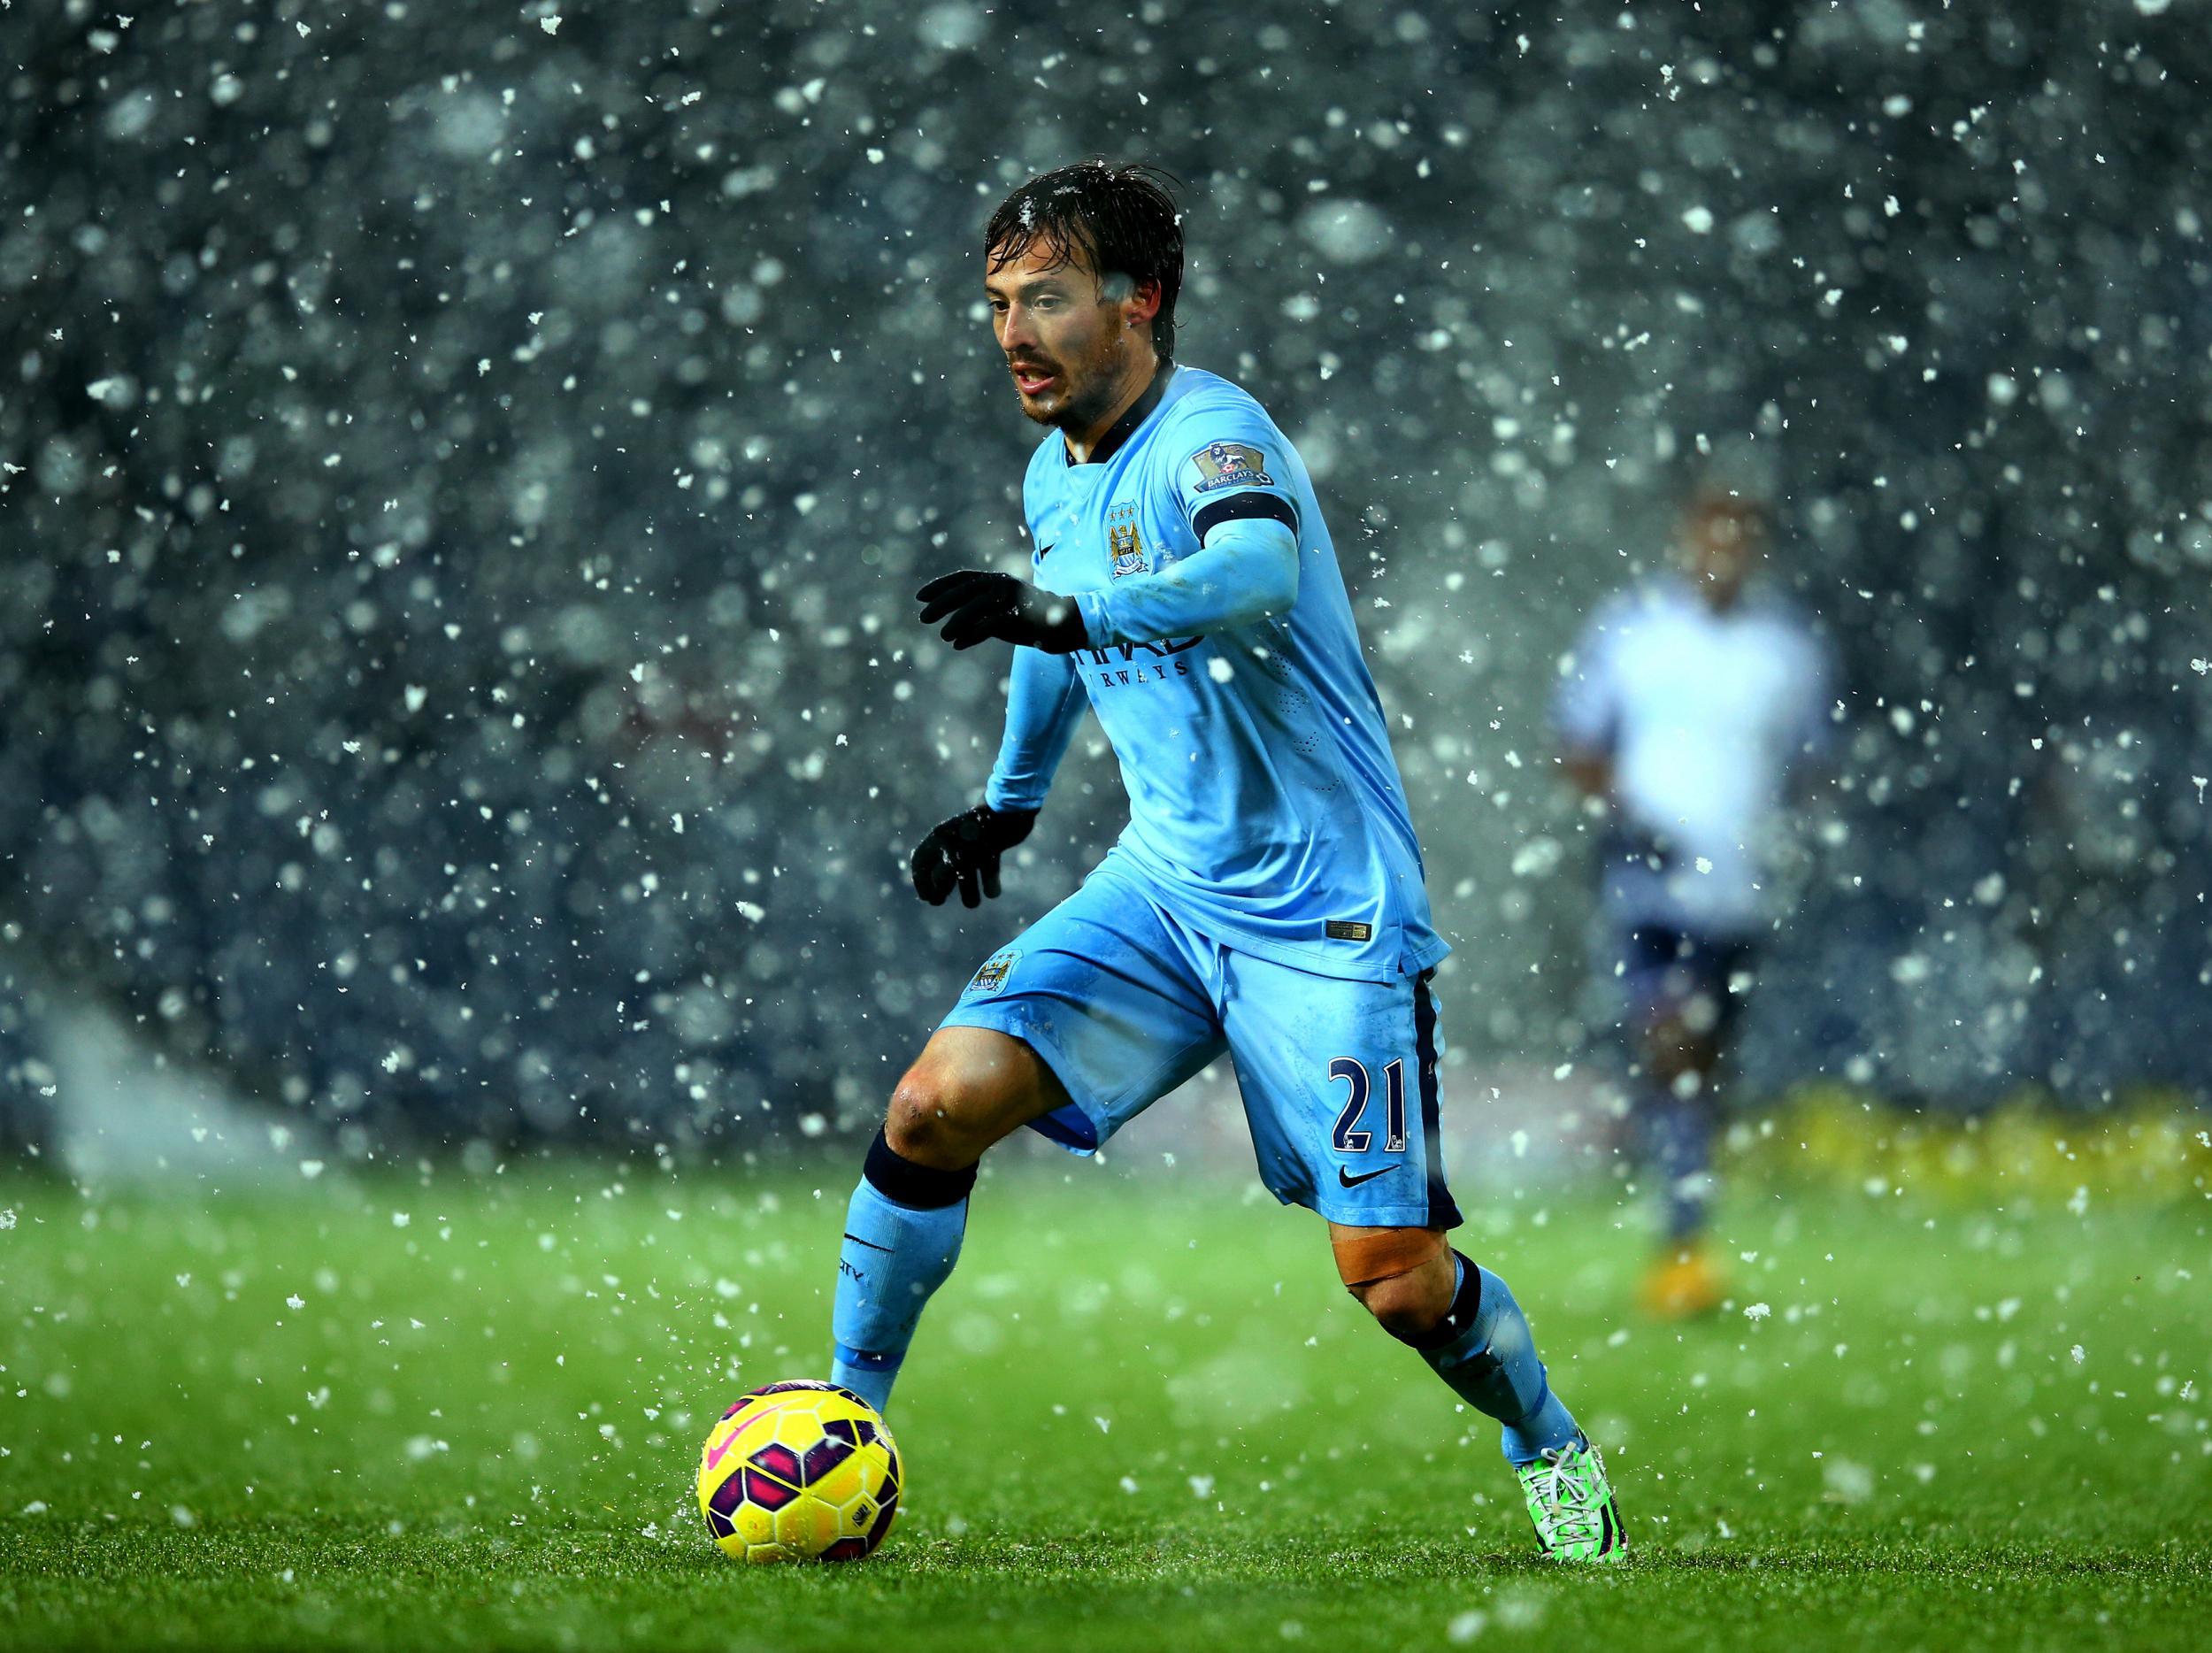 75. David Silva